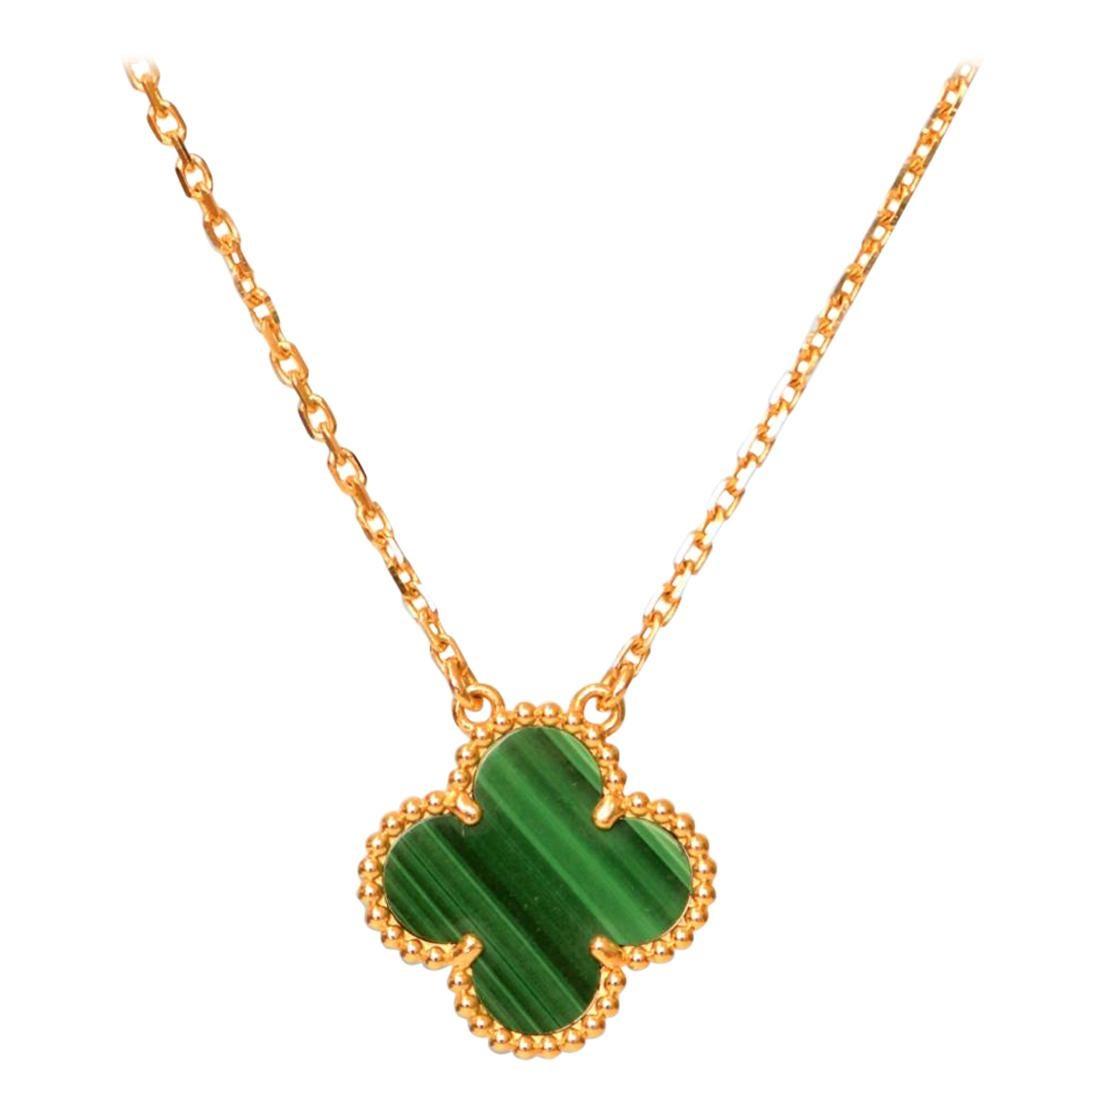 Van Cleef & Arpels Vintage Alhambra Malachite 18 Karat Yellow Gold Pendant